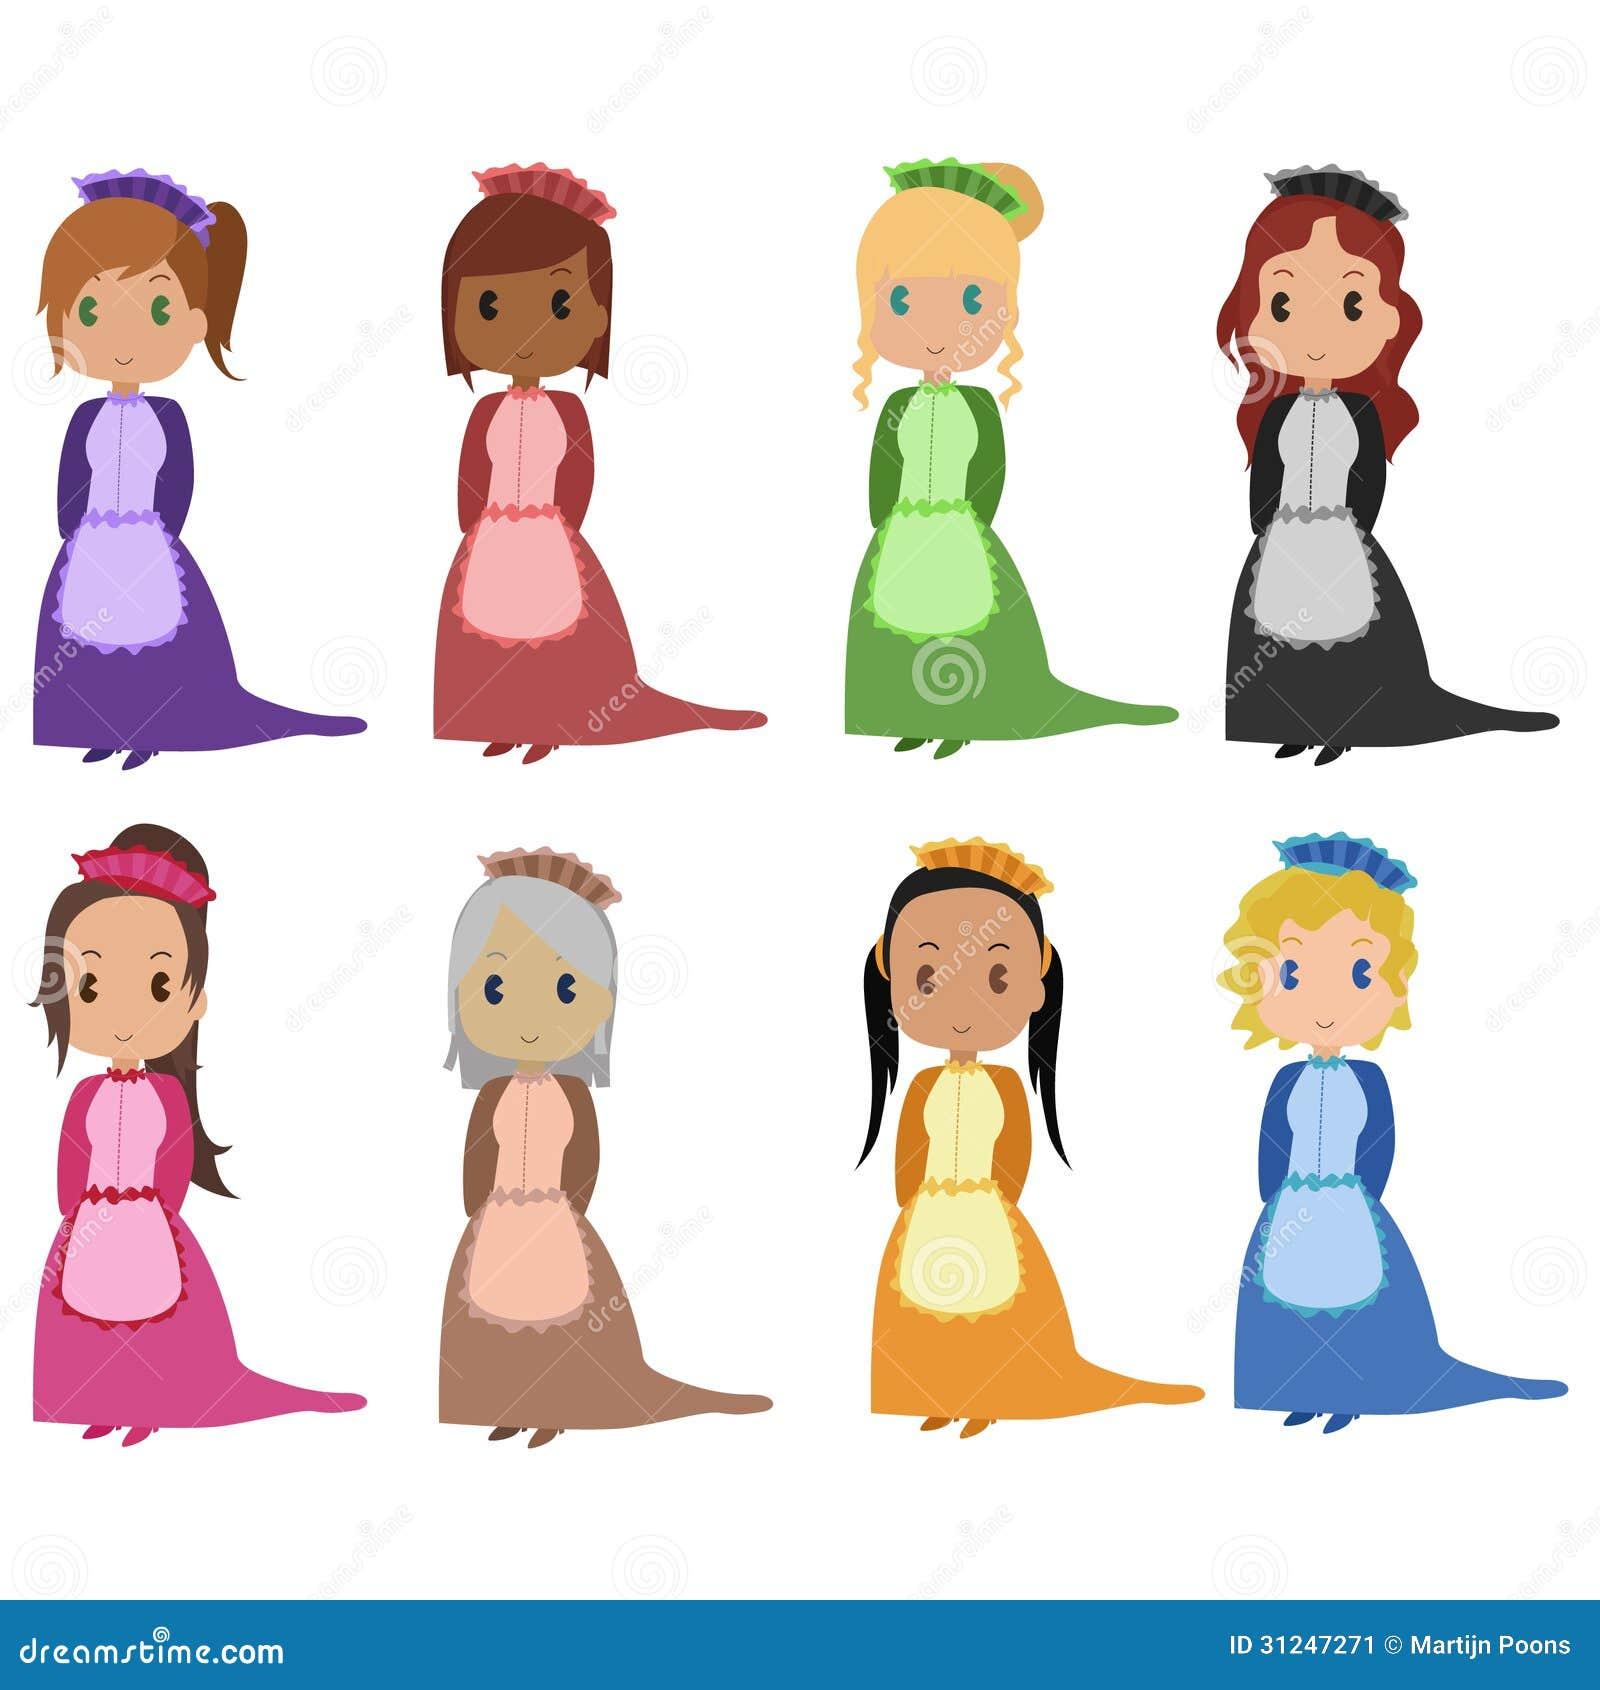 Maids Stock Image Image 31247271